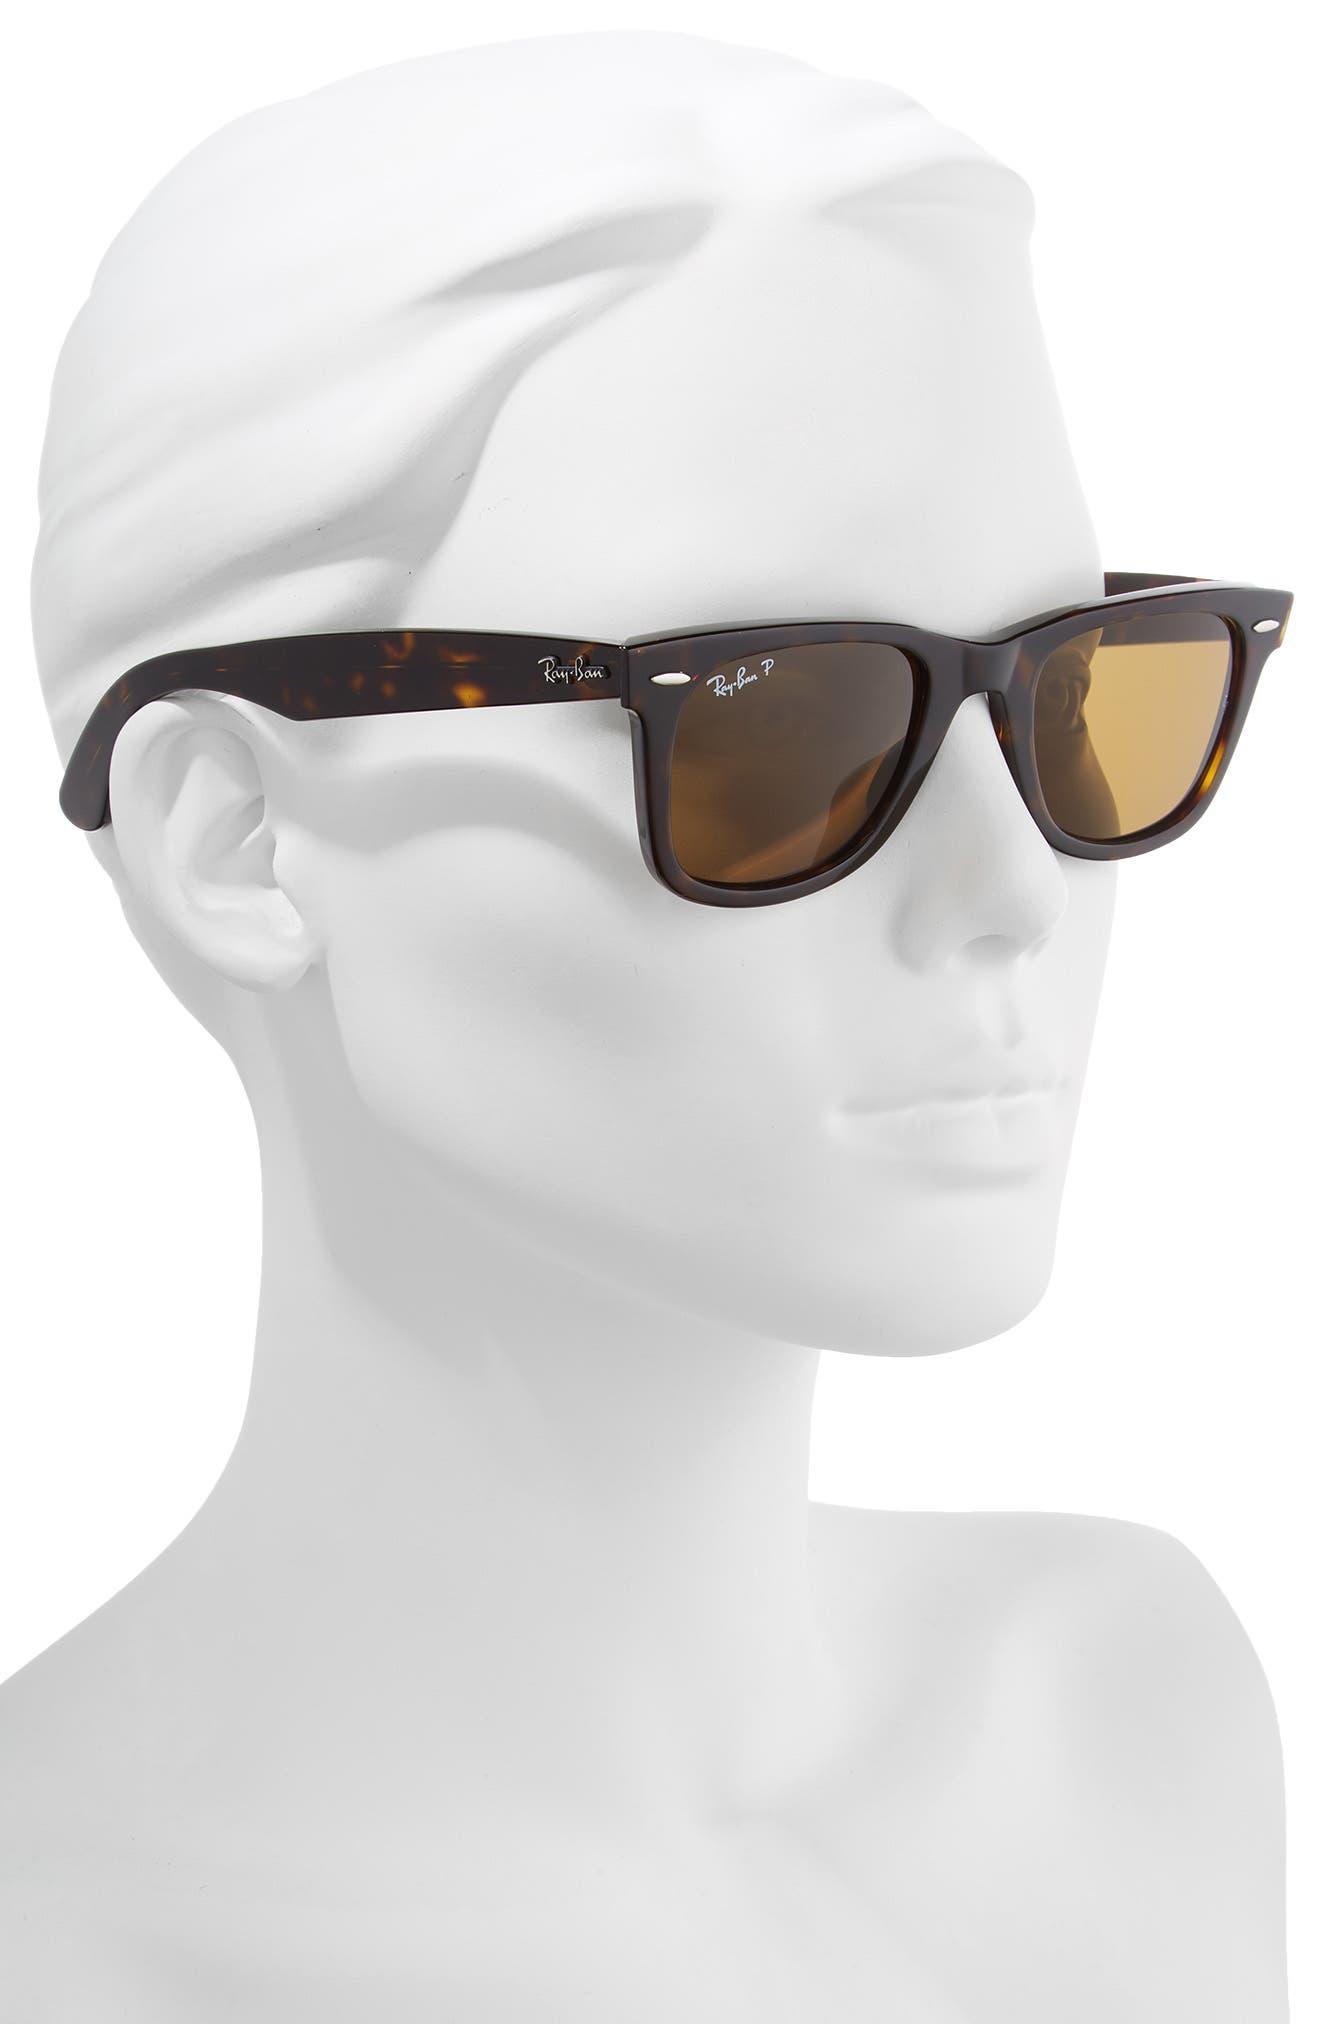 Standard Classic Wayfarer 50mm Polarized Sunglasses,                             Alternate thumbnail 2, color,                             205